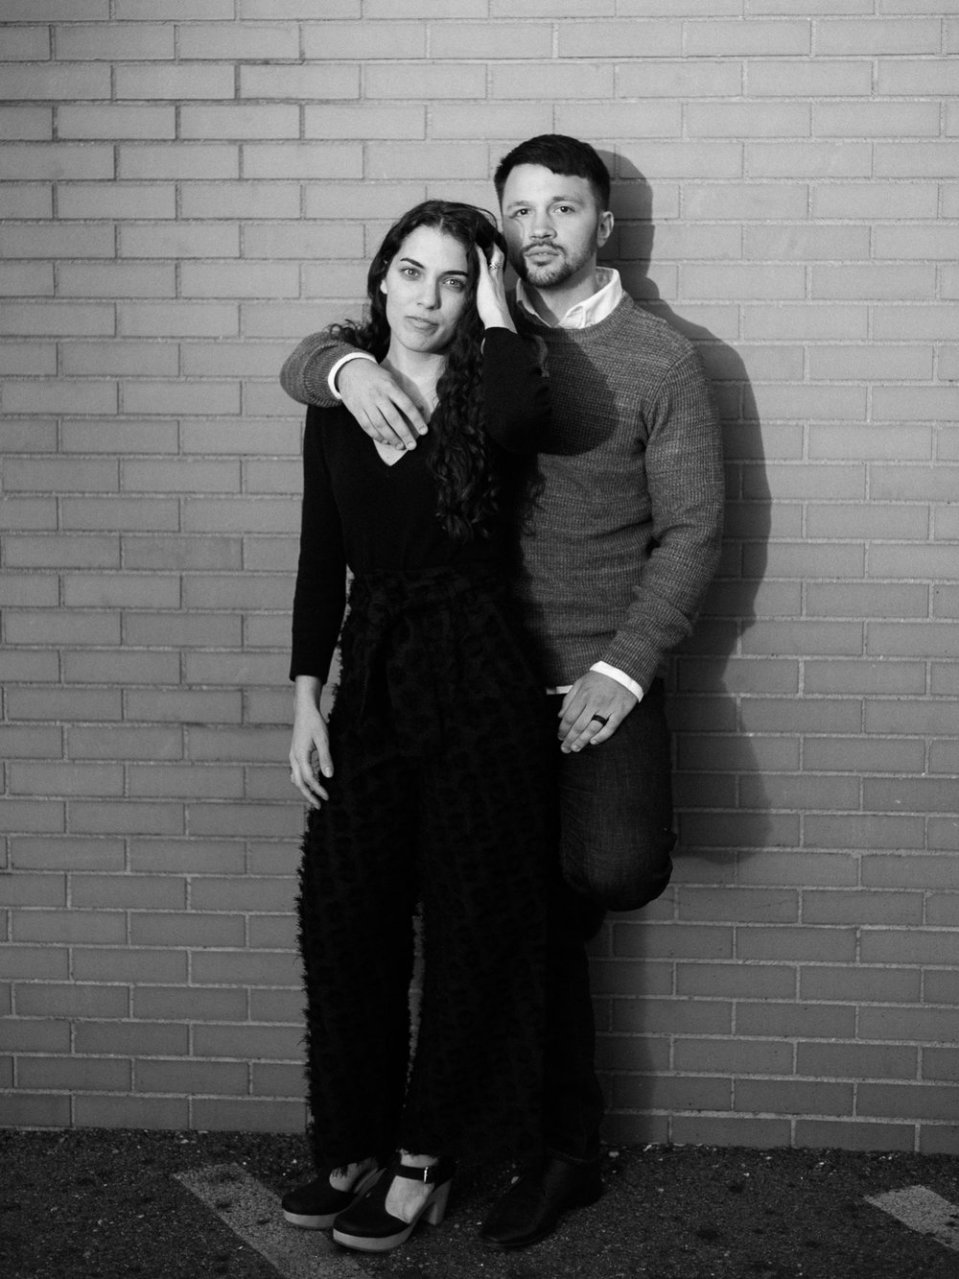 fashion-inspired-couples-photos-14.jpg